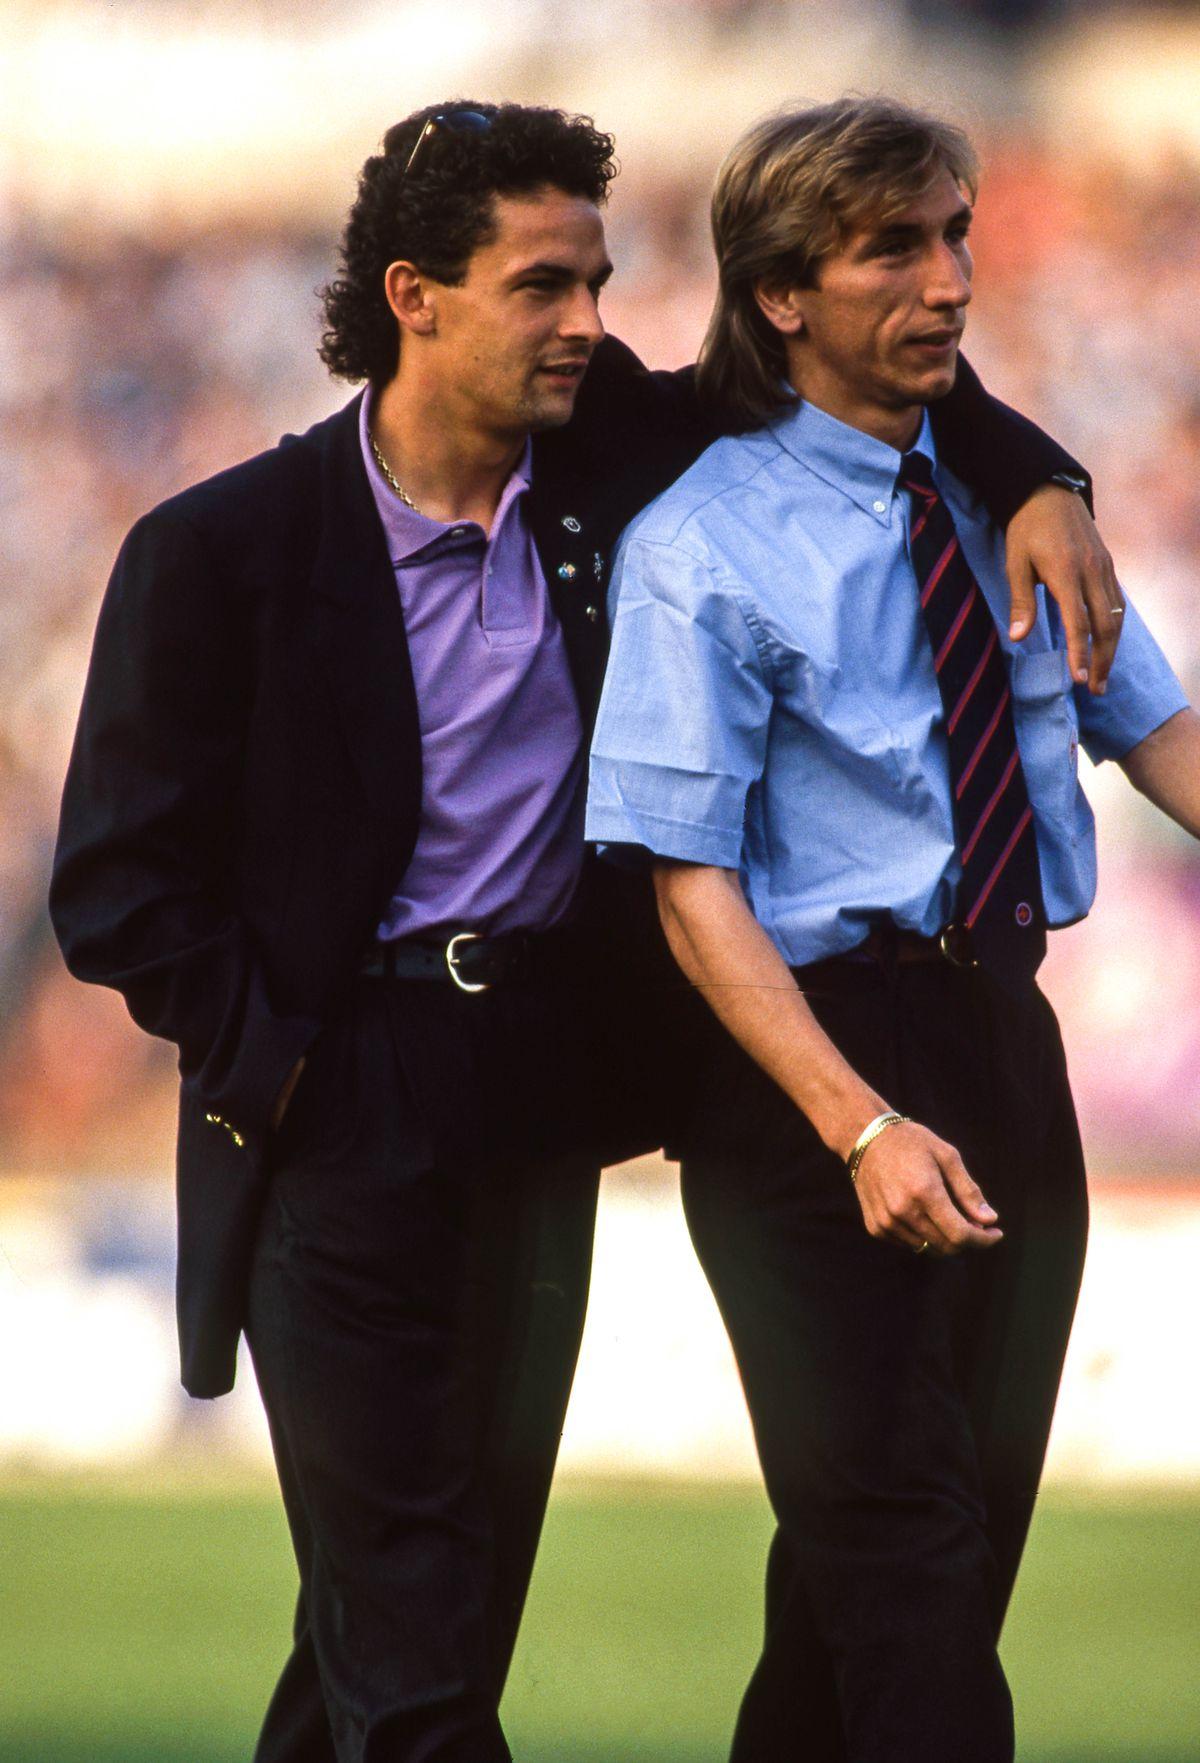 Juventus Turin v Fiorentina - UEFA Cup Final, first leg 1990